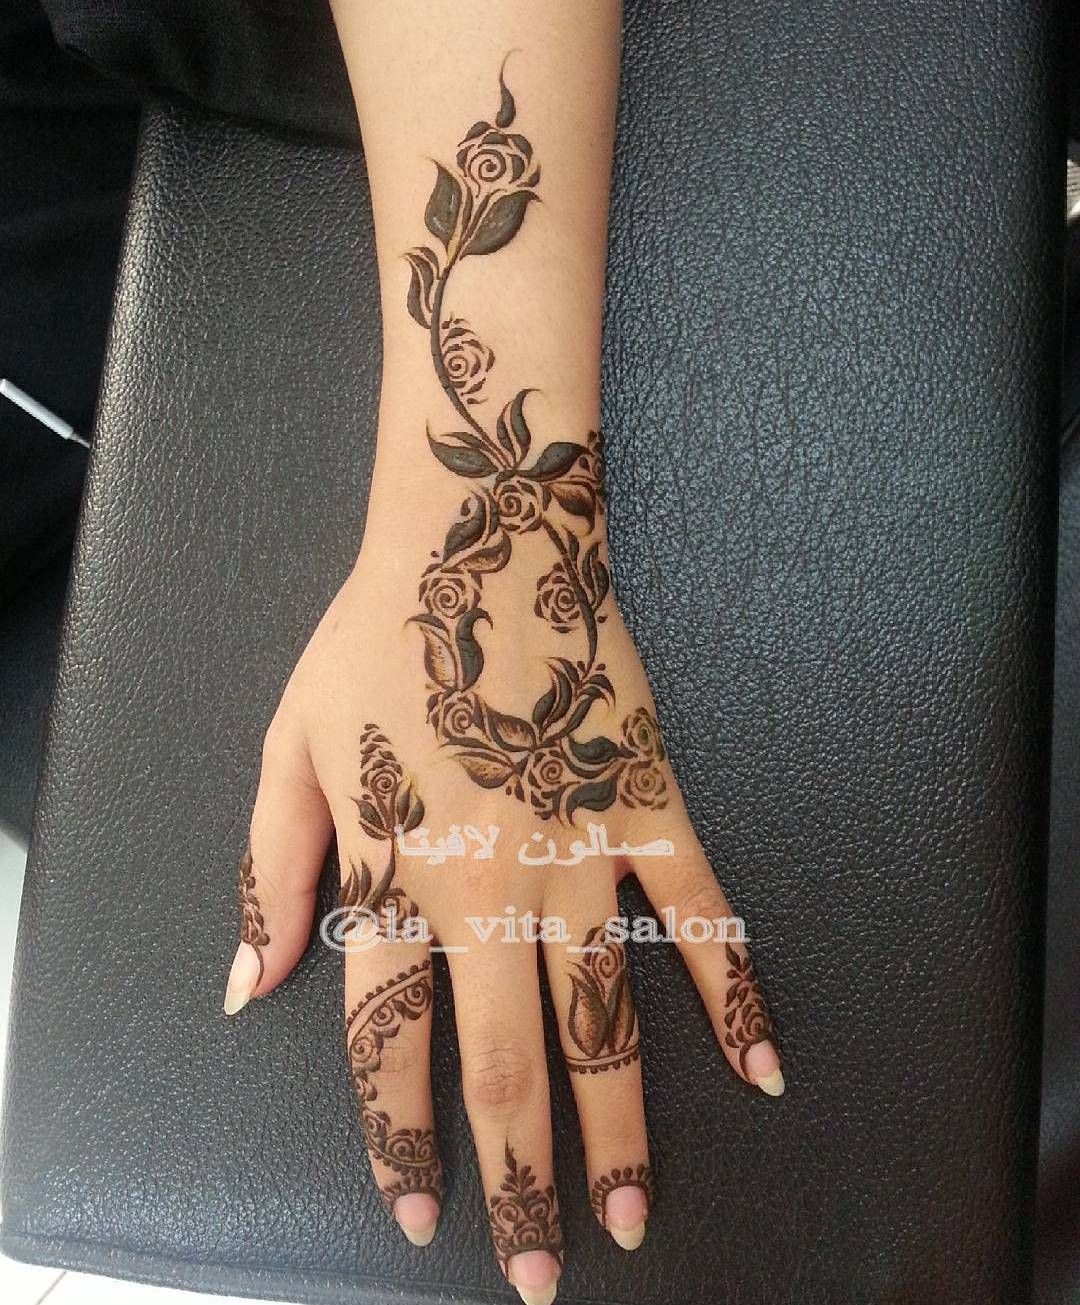 1 081 Likes 6 Comments Beauty Mazarin Design On Instagram La Vita Salon Ward454 Ward Henna Designs Hand Latest Mehndi Designs Arabic Henna Designs